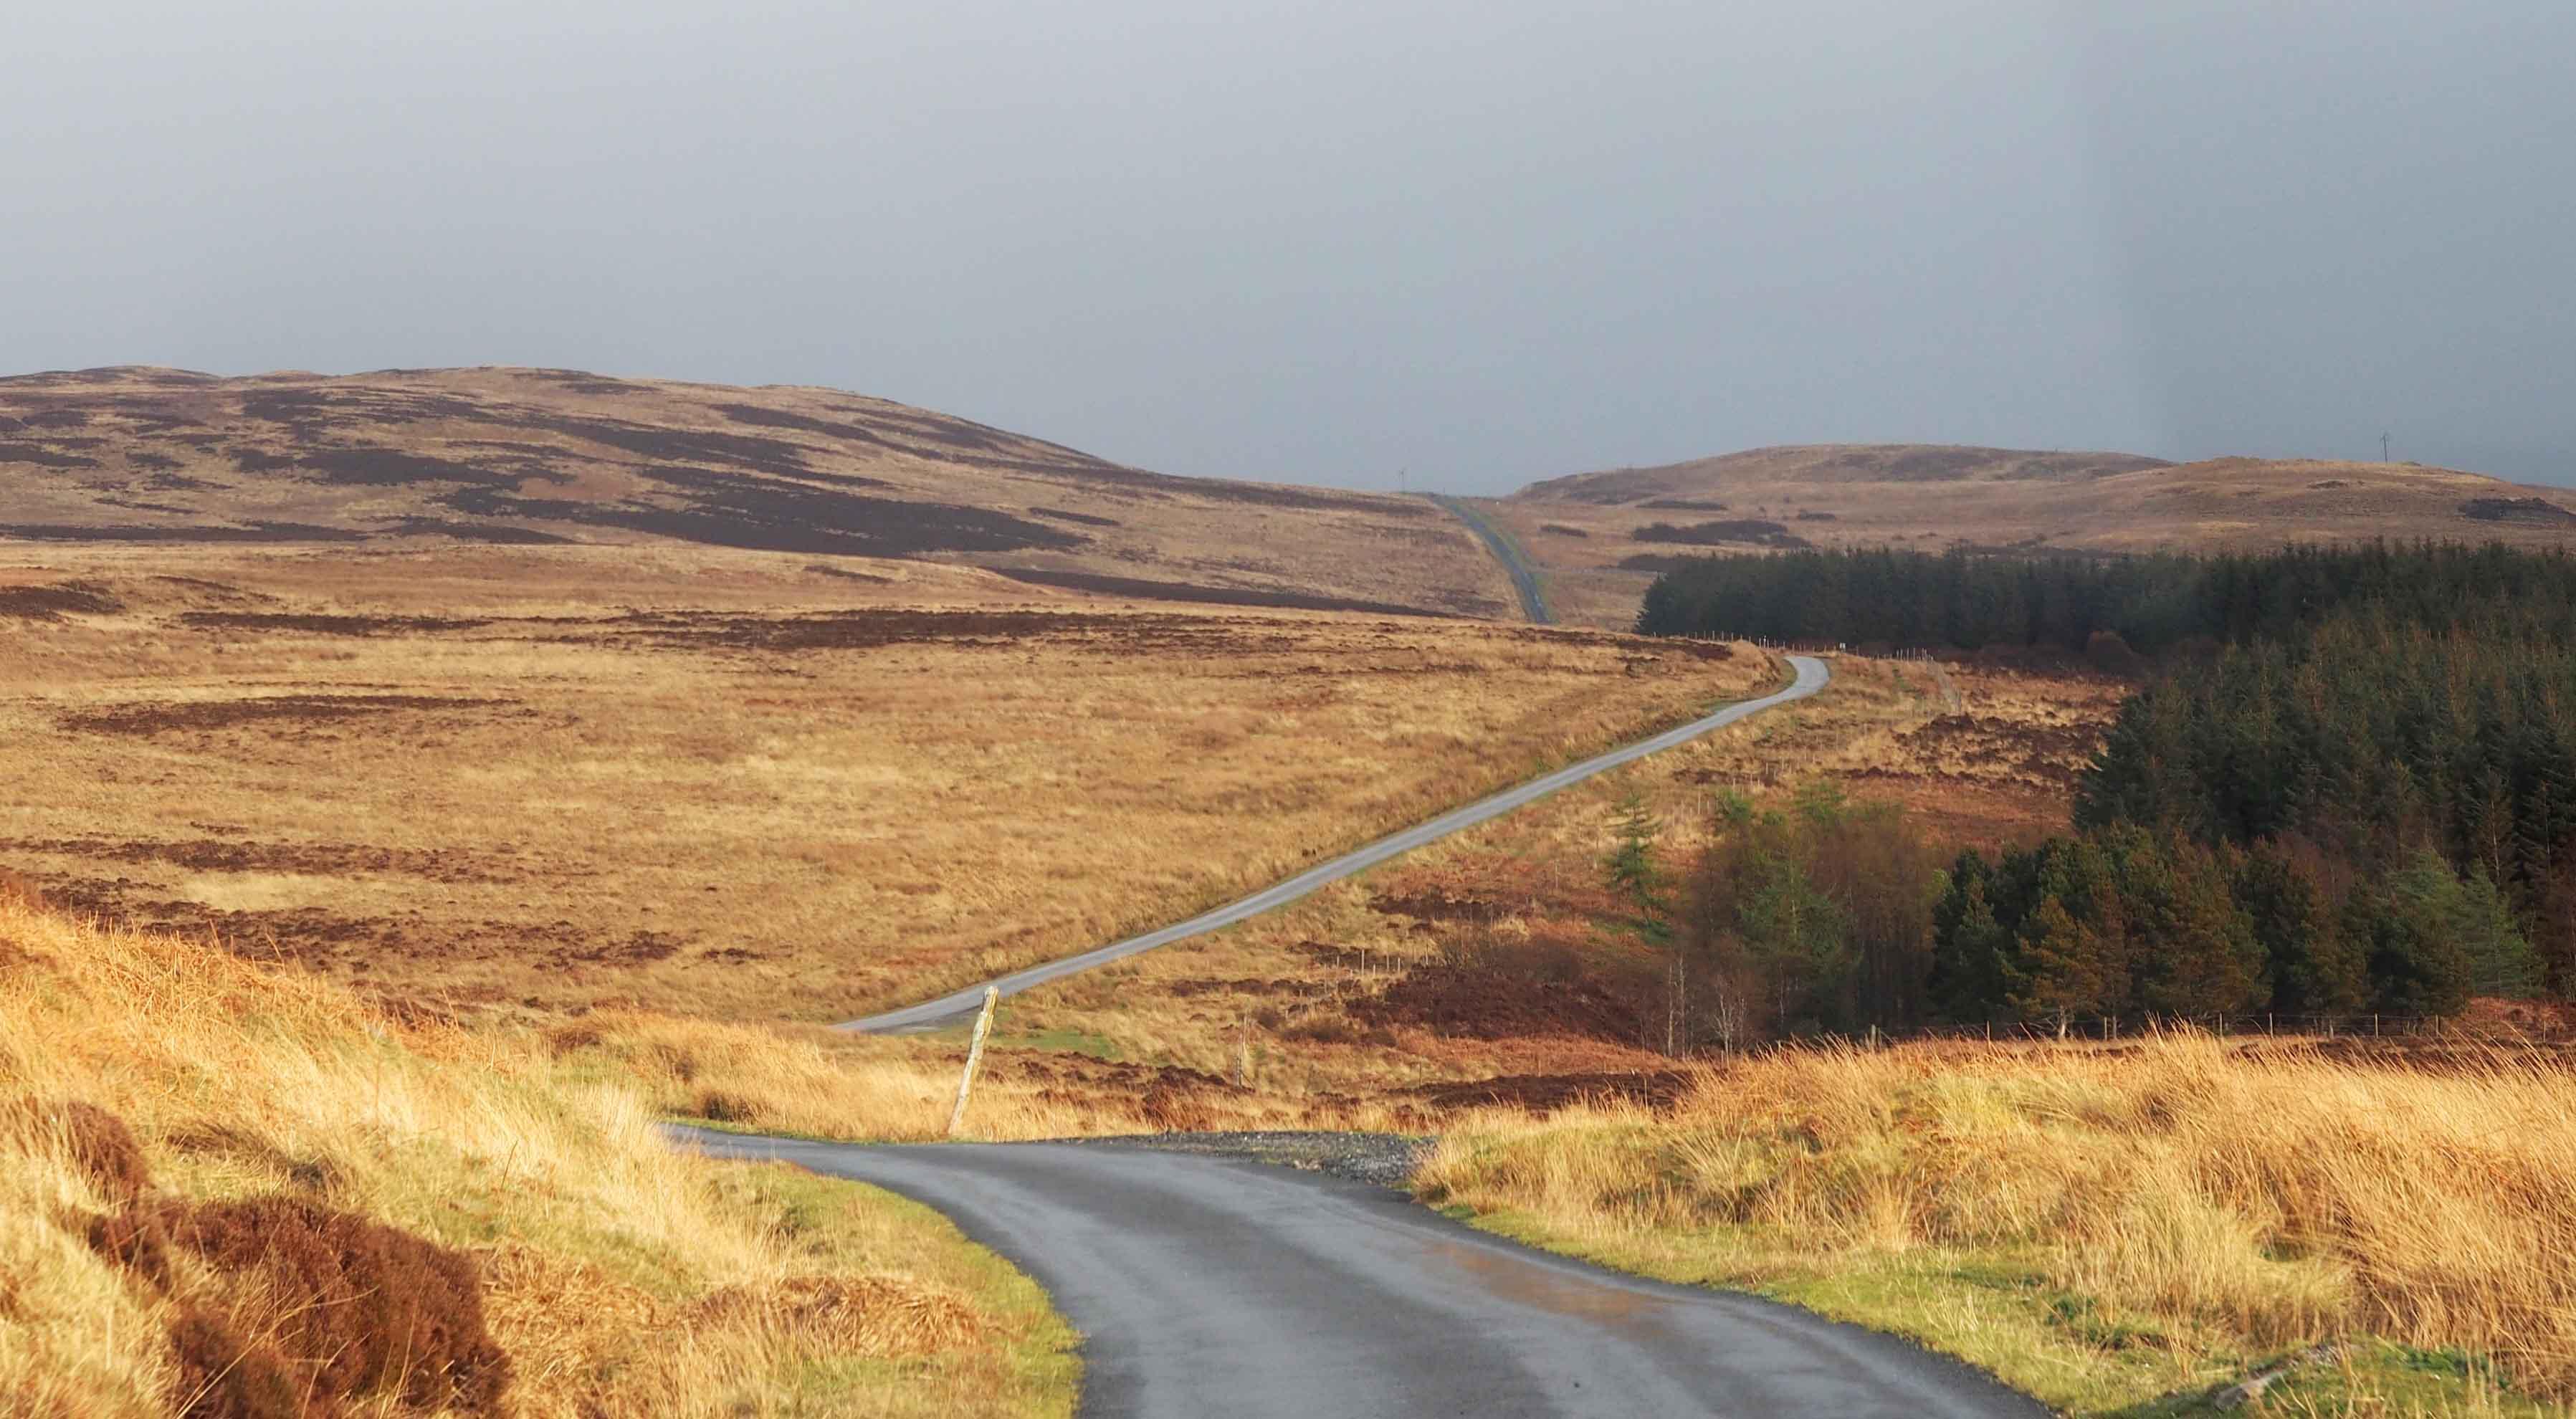 Henri Goossen Jura Islay Schotlandreis whiskyvlog whiskyteacher whiskyproeverij Highlands Western Isles dfds klm Ardbeg Highland Park Bowmore